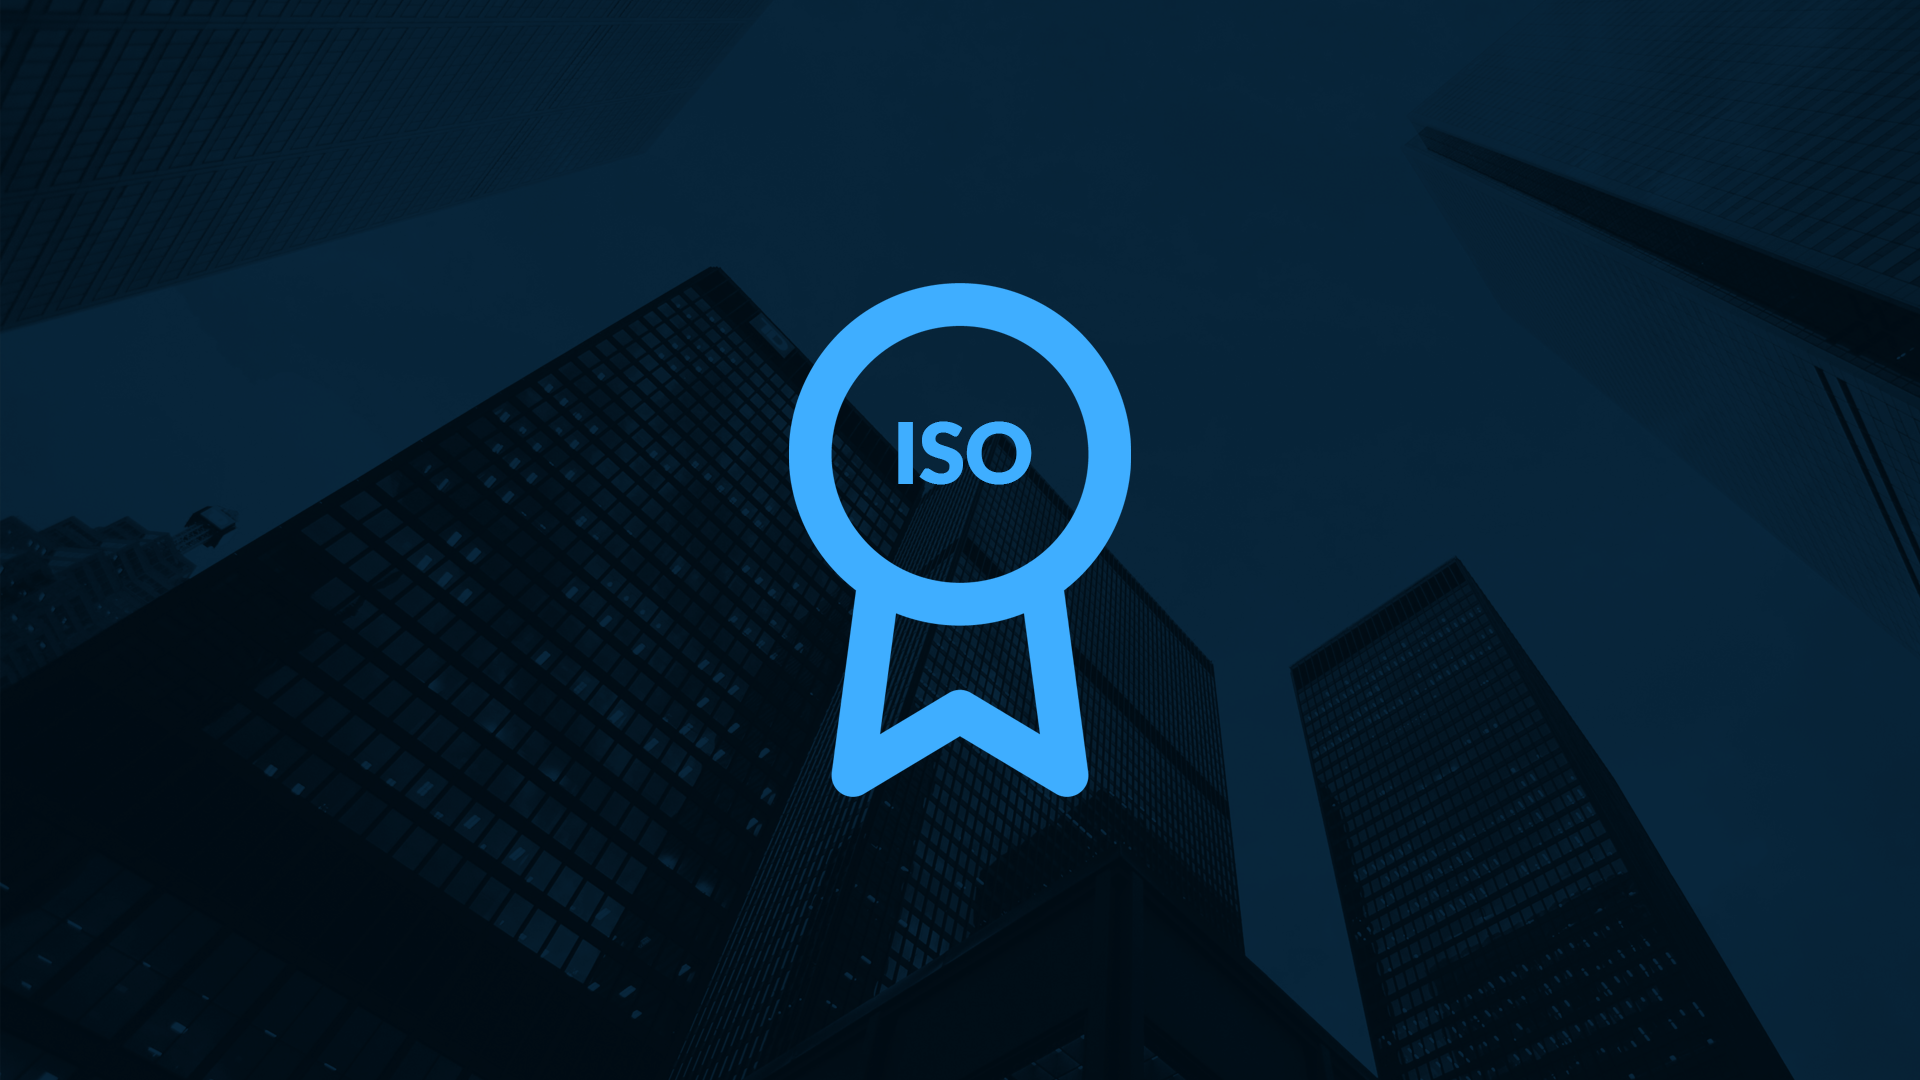 Sichere Gebäudetechnik dank ISO-Zertifikat